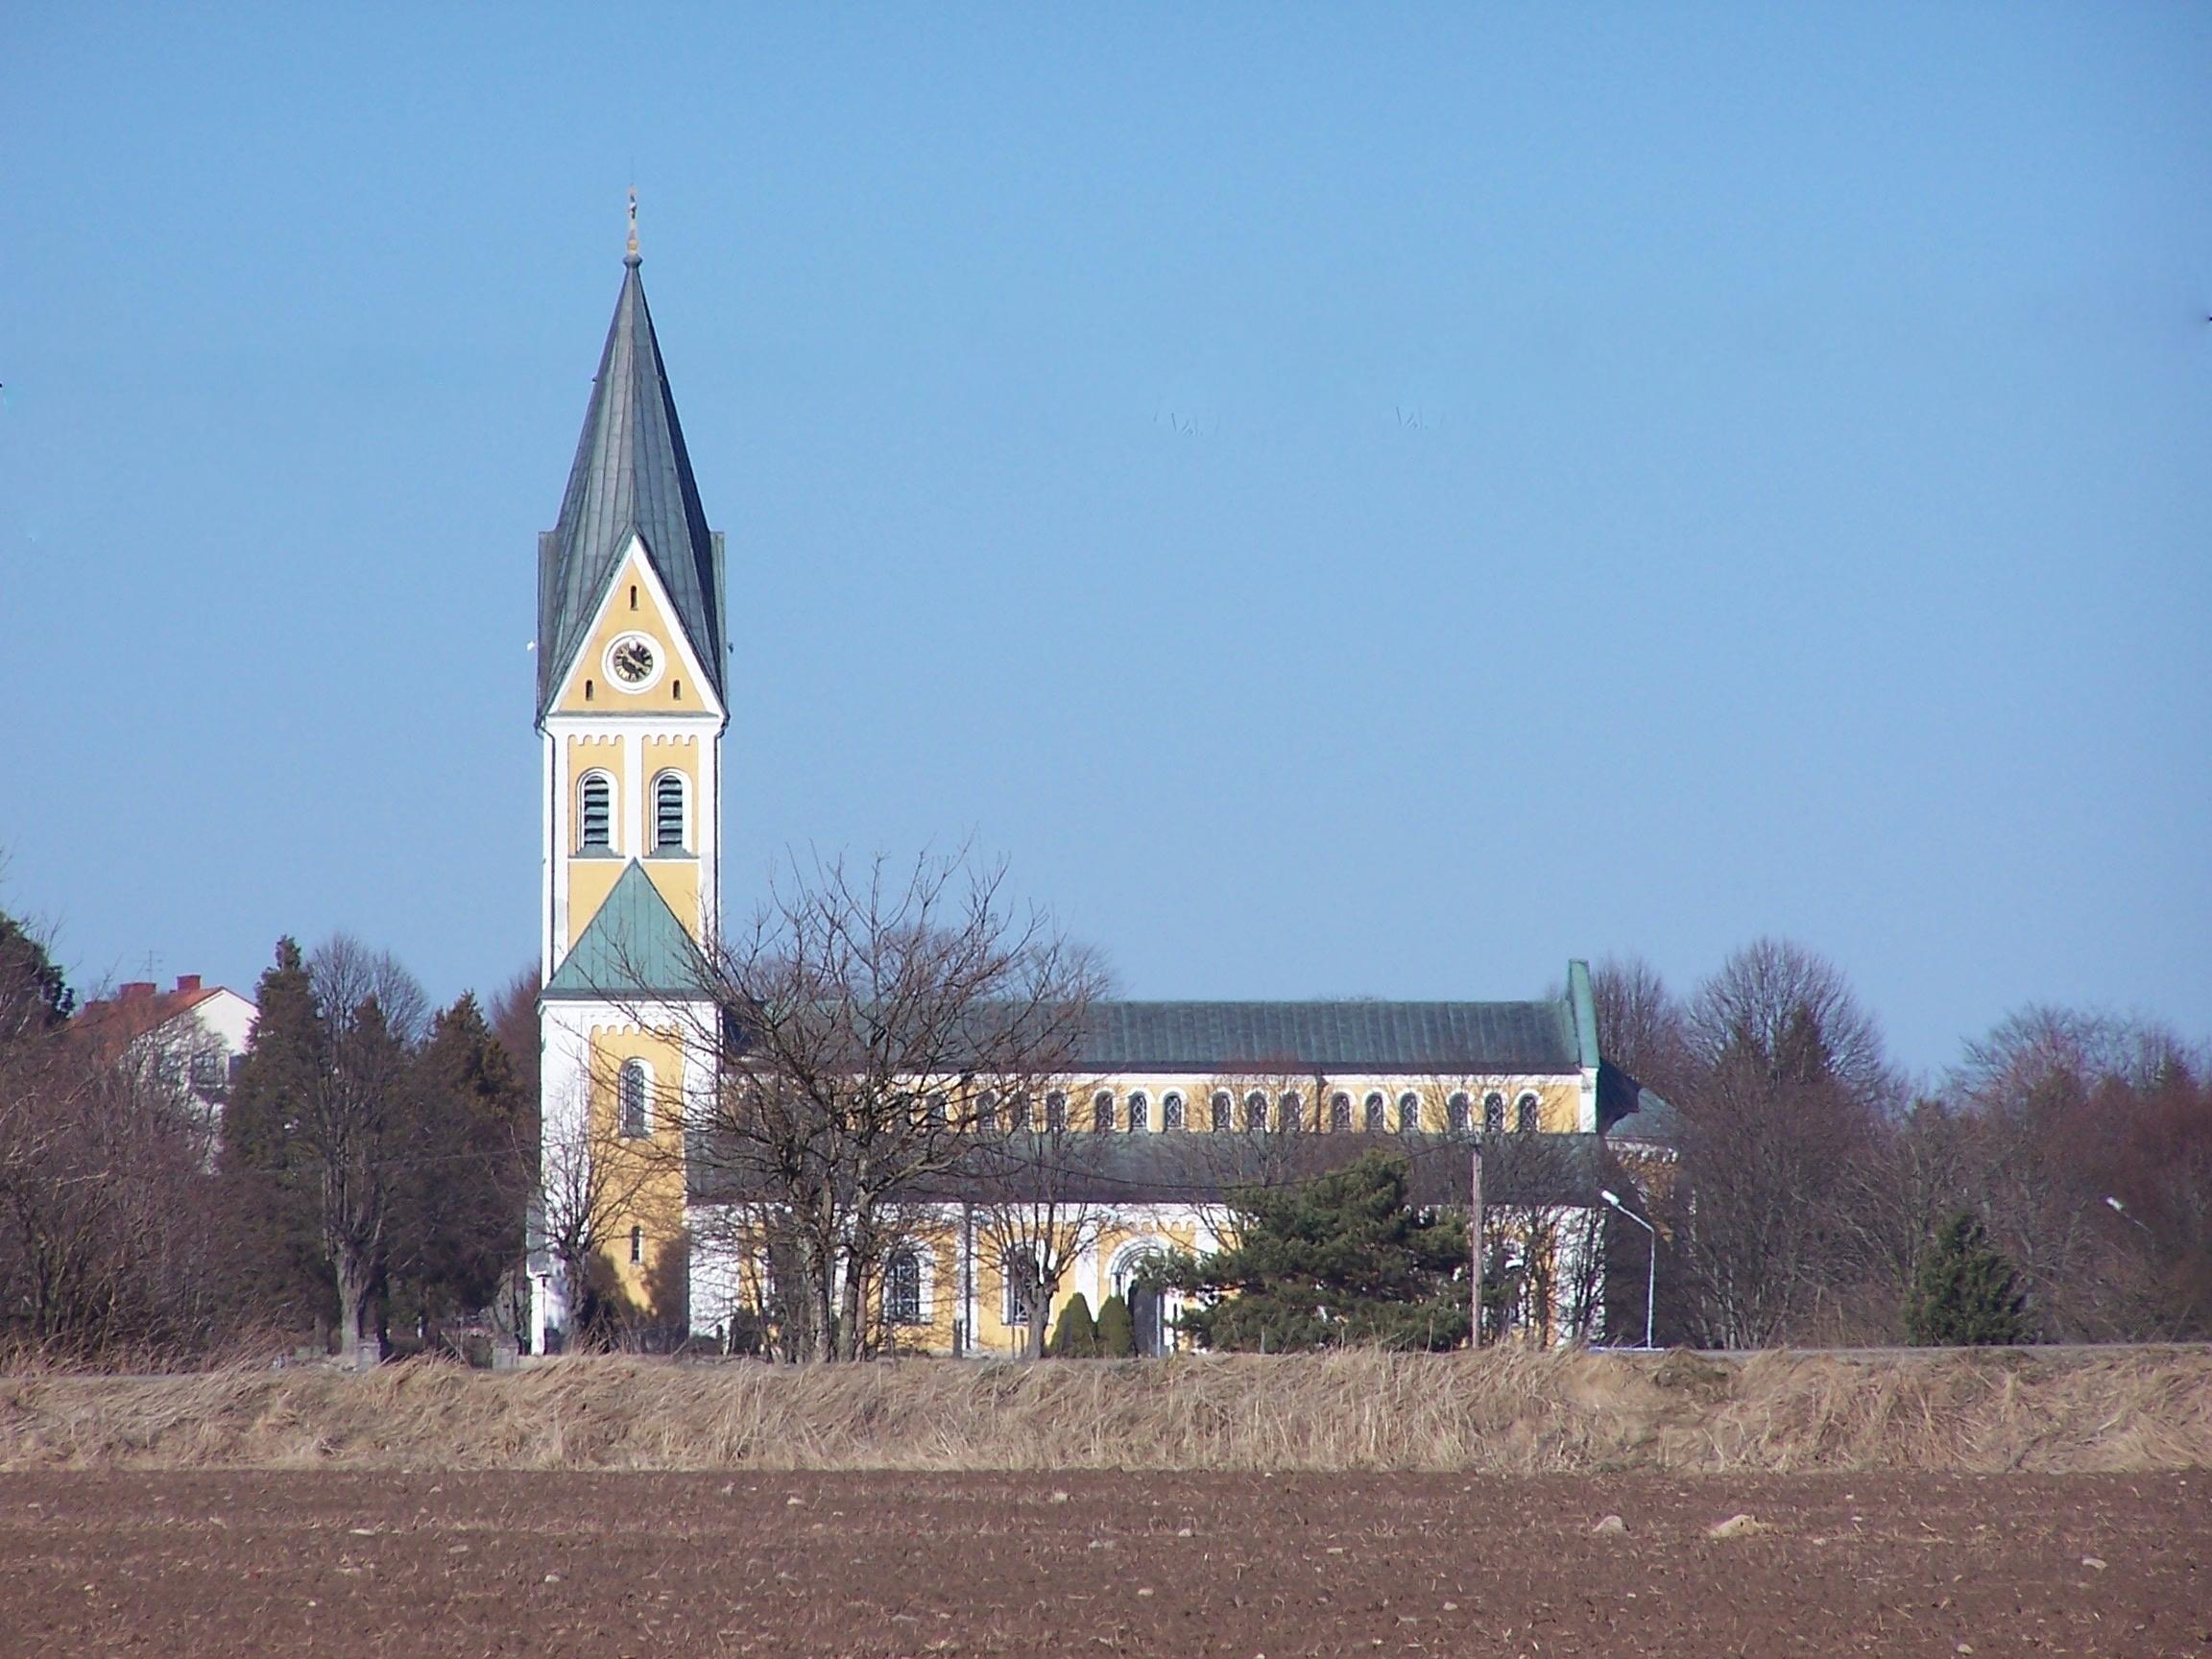 Bräkne-Hoby